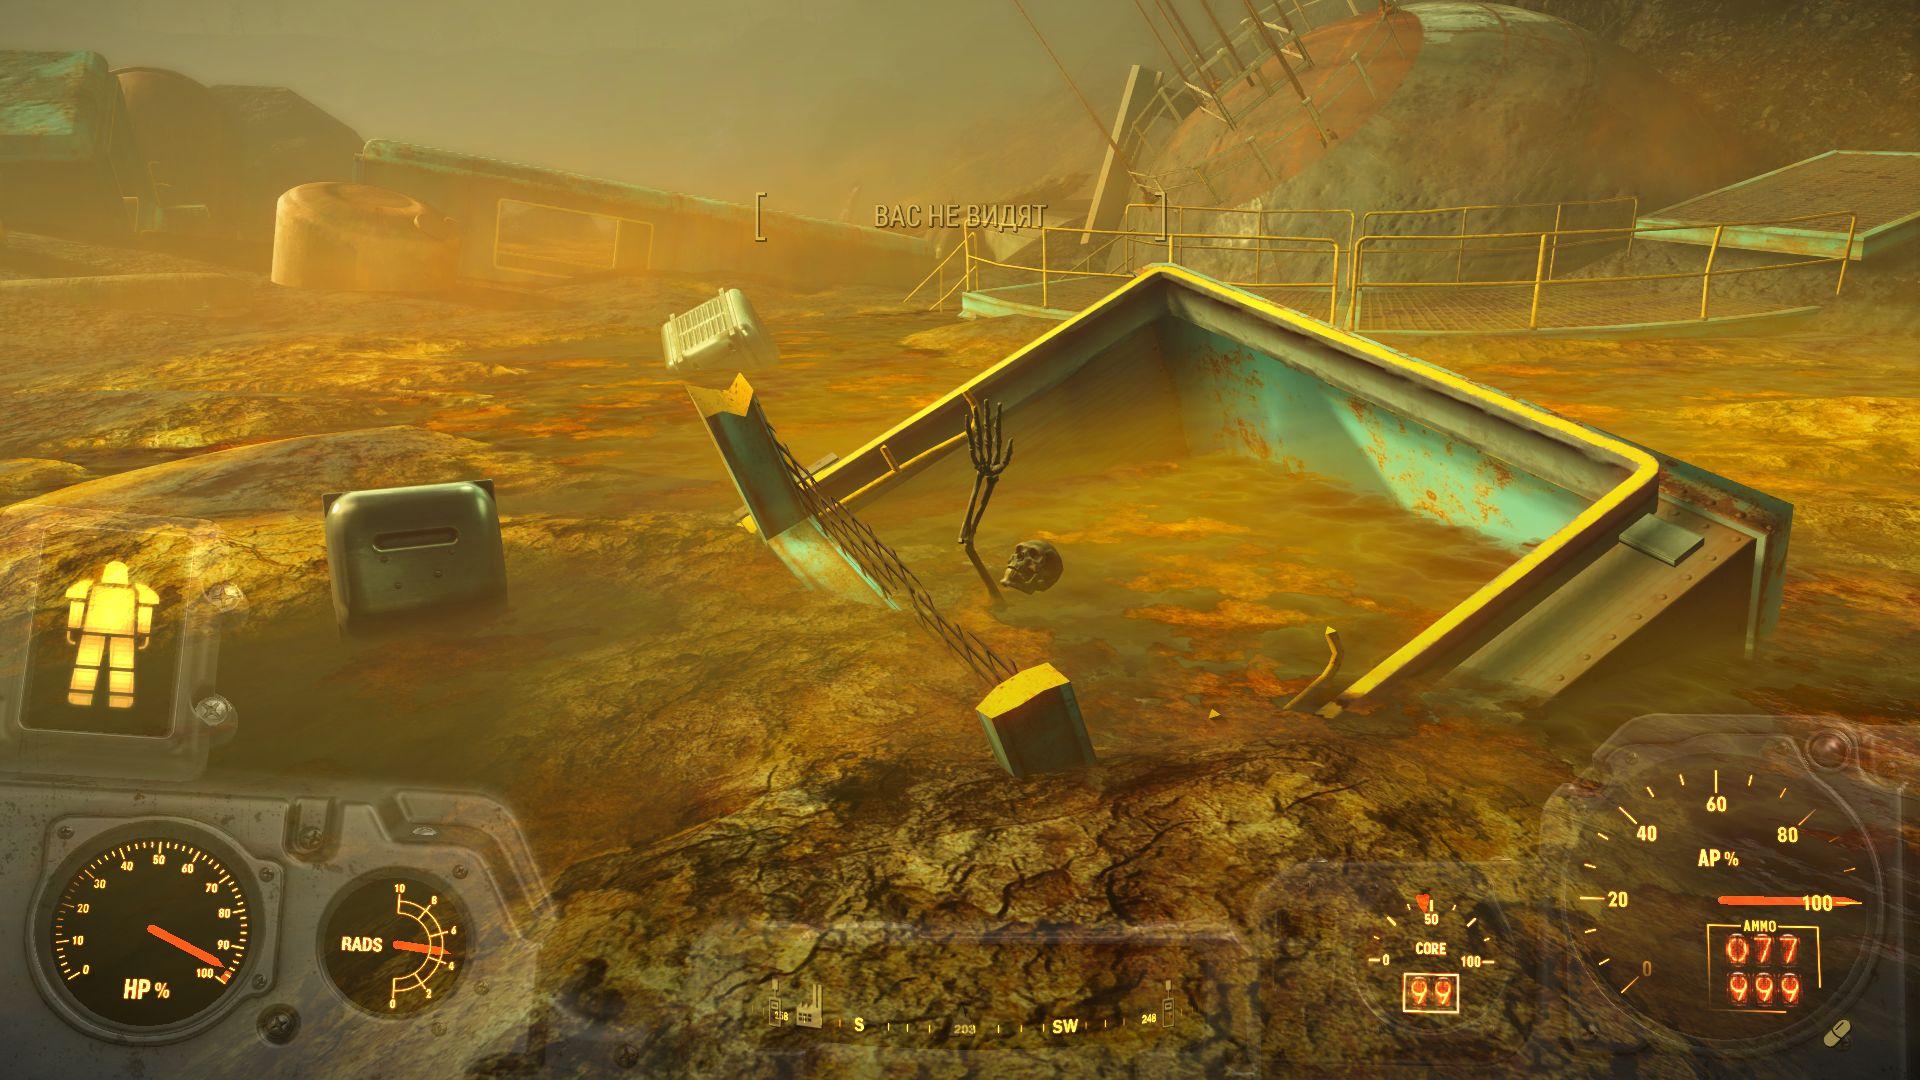 Он тонул, но его никто не спас - Fallout 4 скелет